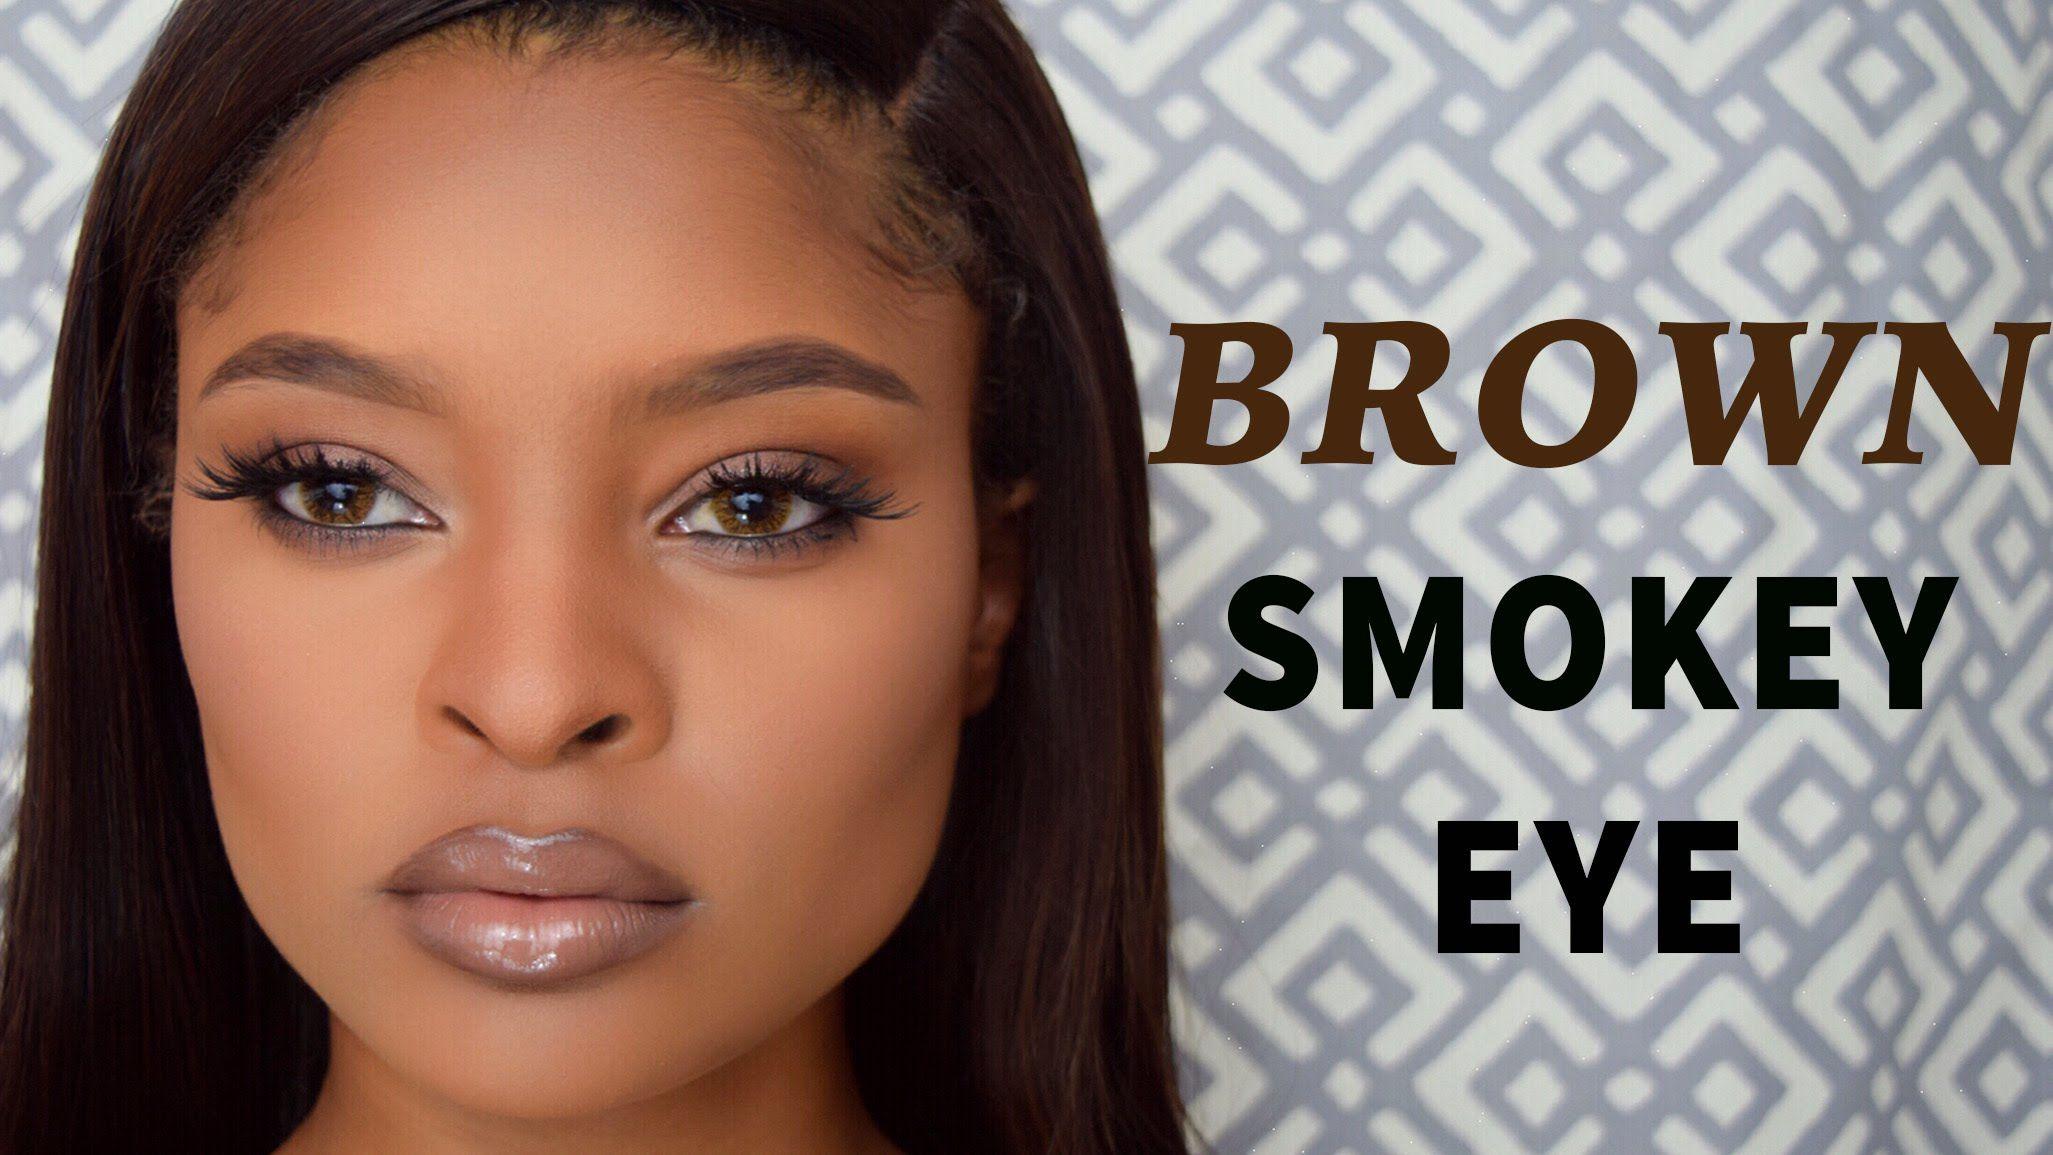 BROWN SMOKEY EYE KRYSSARTT Smokey eye for brown eyes